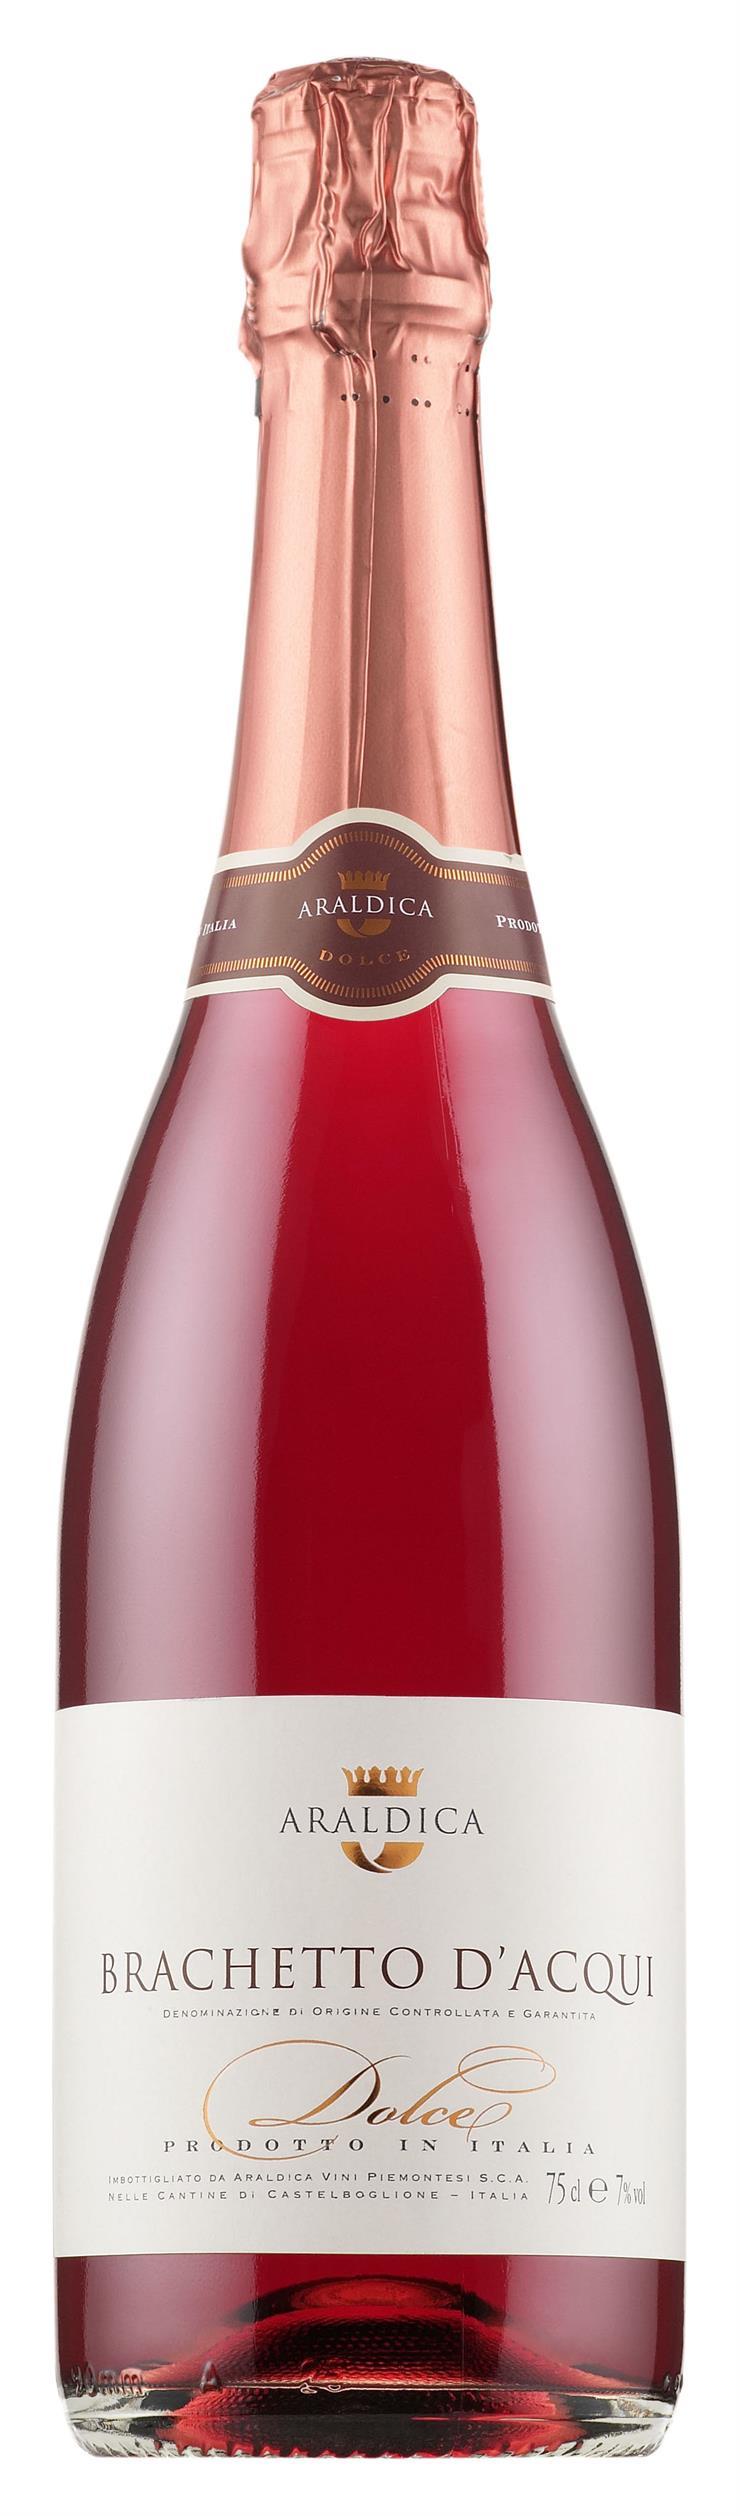 Araldica Brachetto D Acqui Dolce Products Alko Wine Bottle Rose Wine Bottle Strawberry Jam